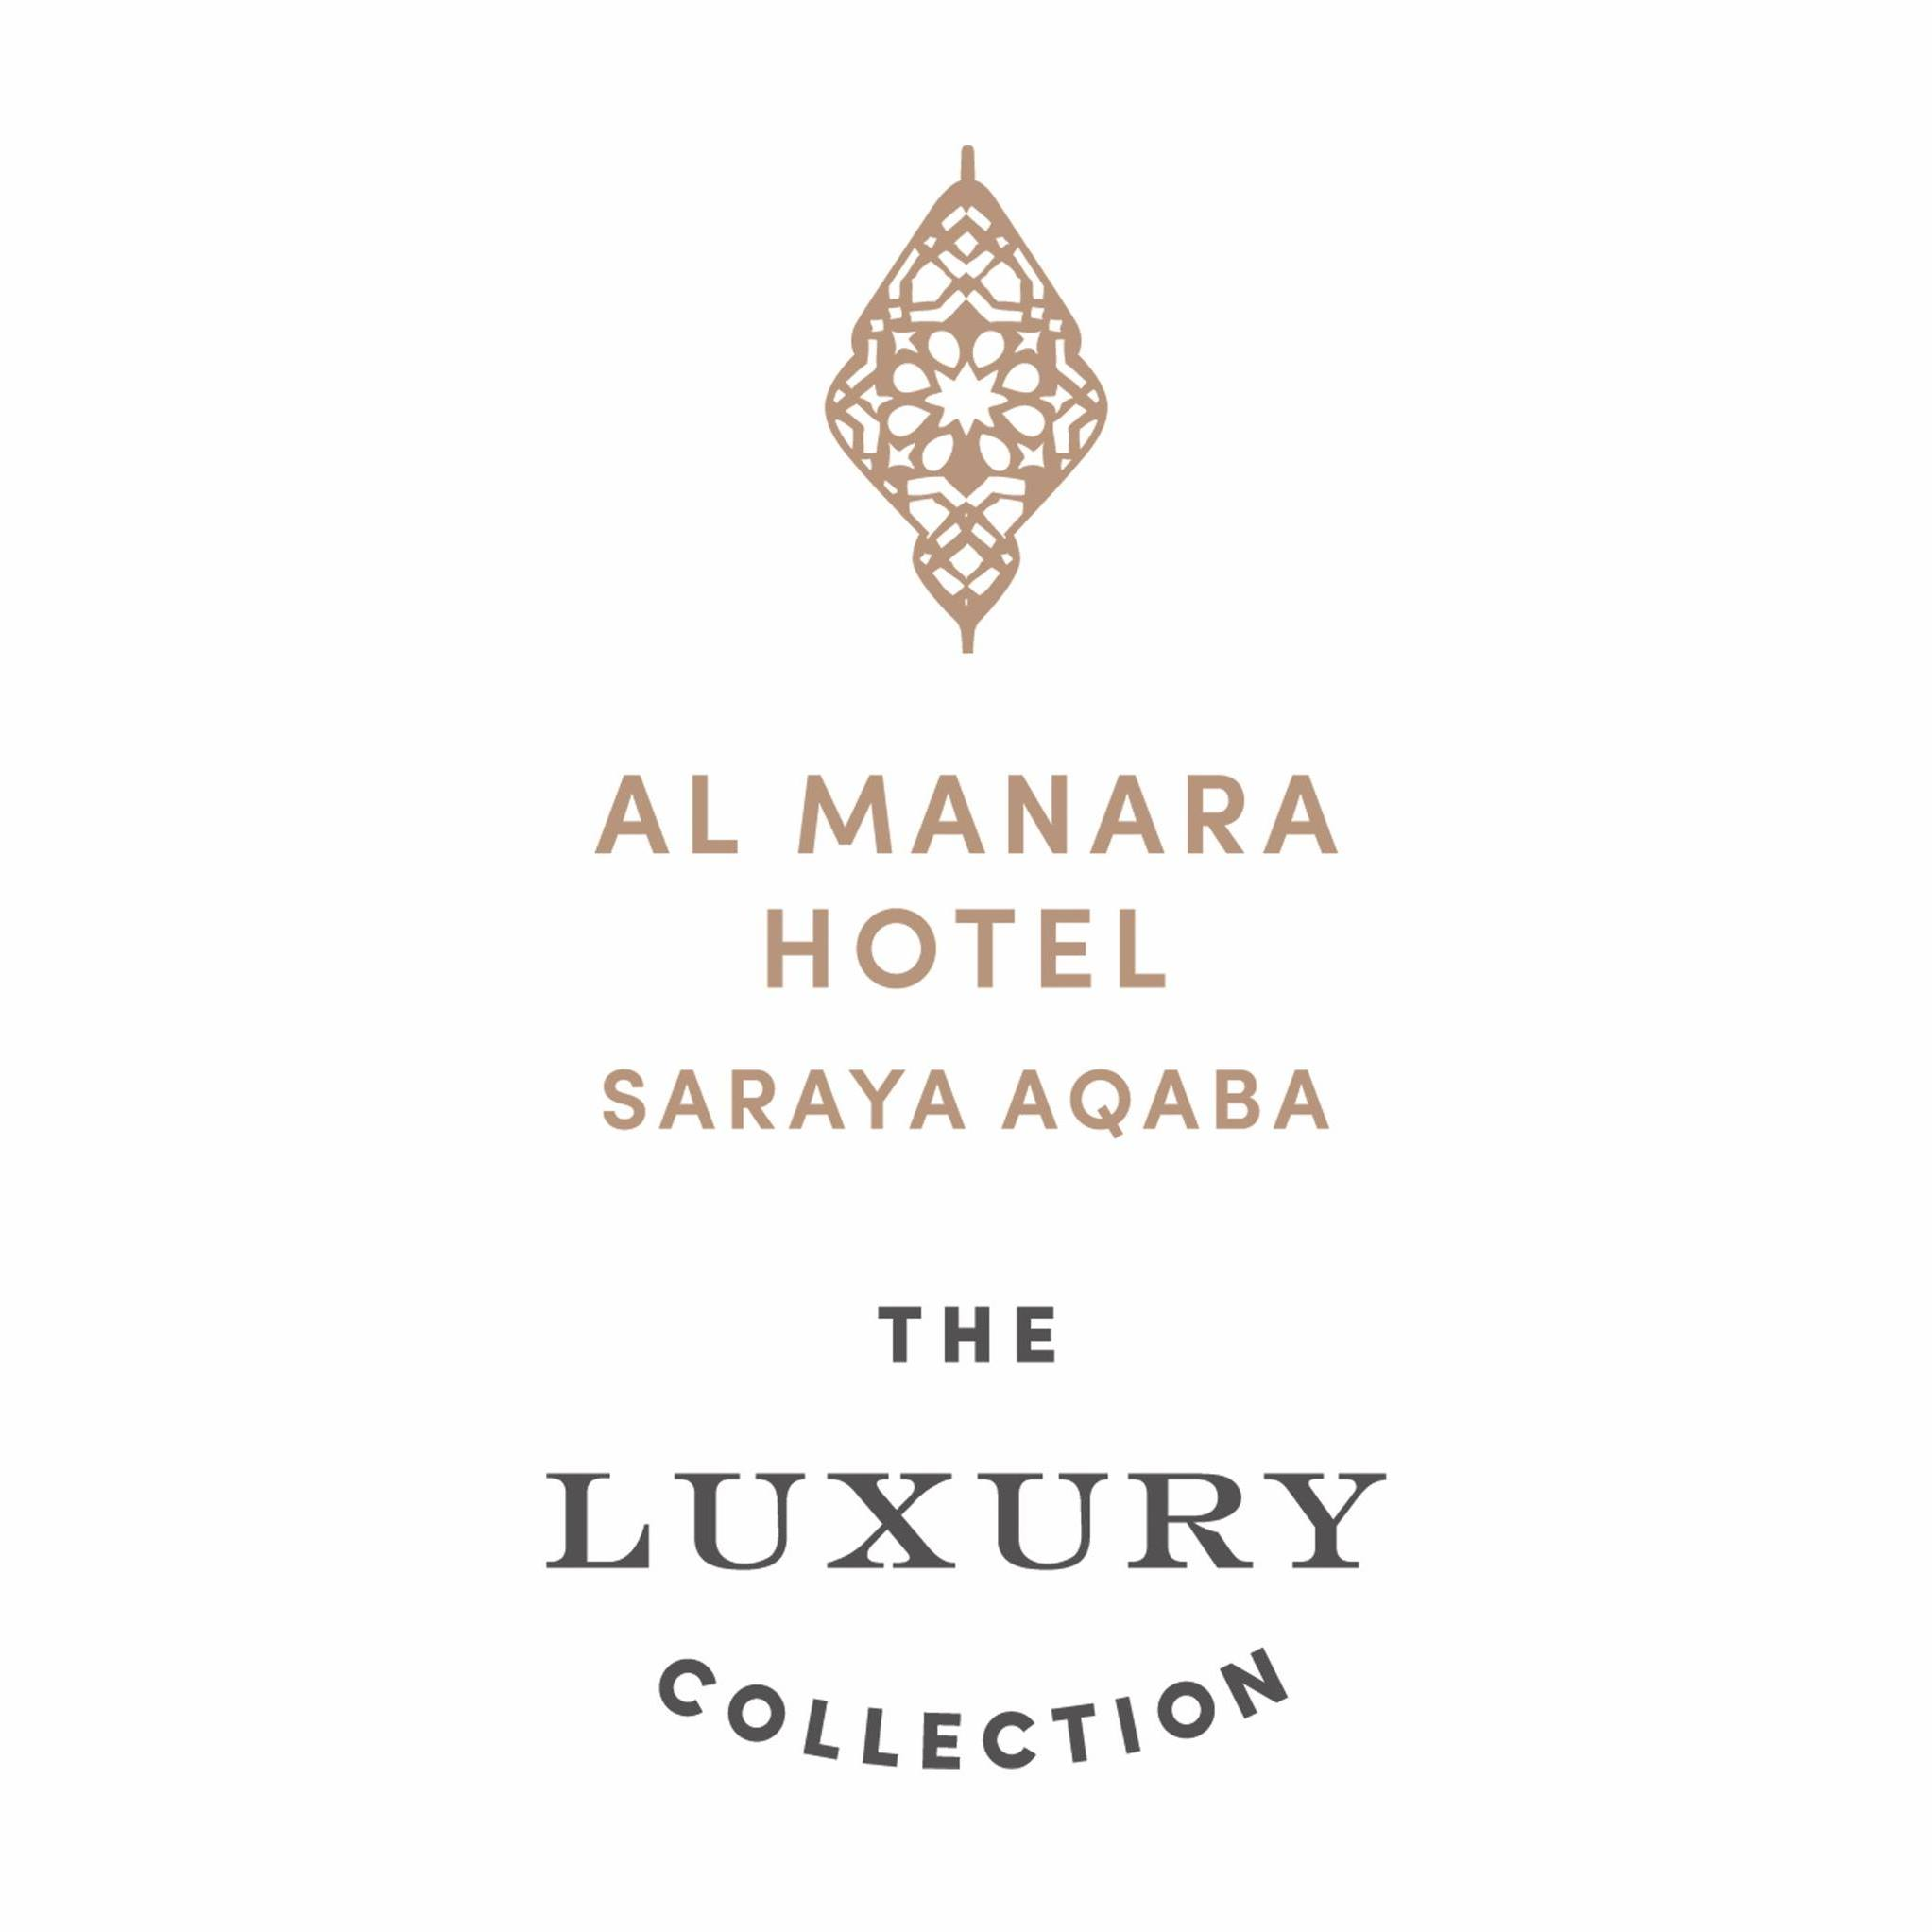 HIH - Marriot Bonvoy - Al Manara Luxury Collection